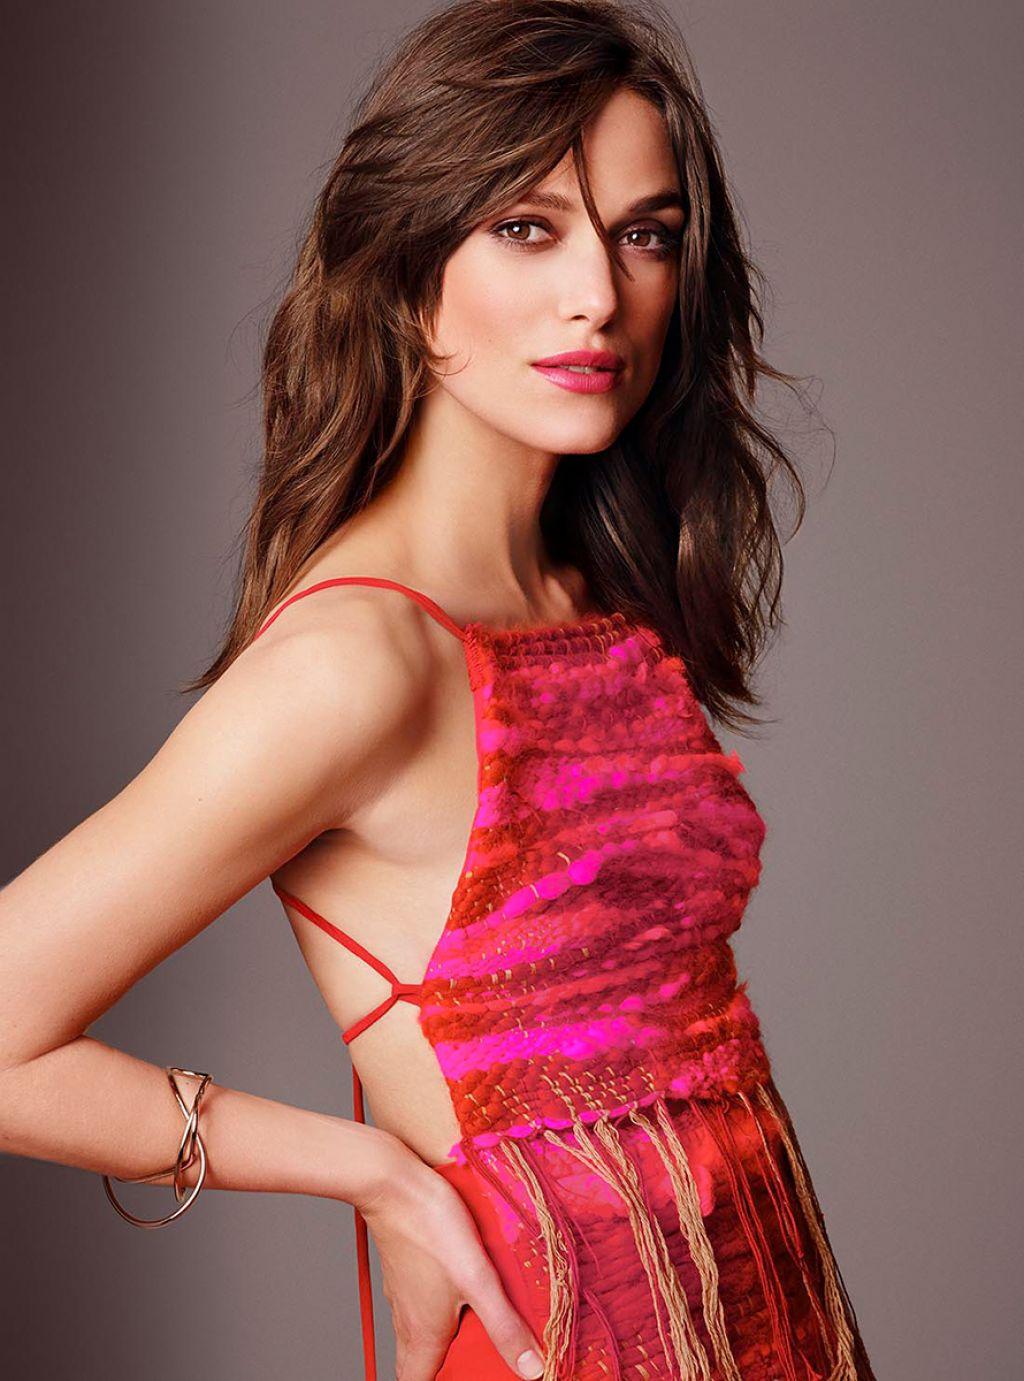 Keira Knightley Tom Munro Photoshoot For Glamour